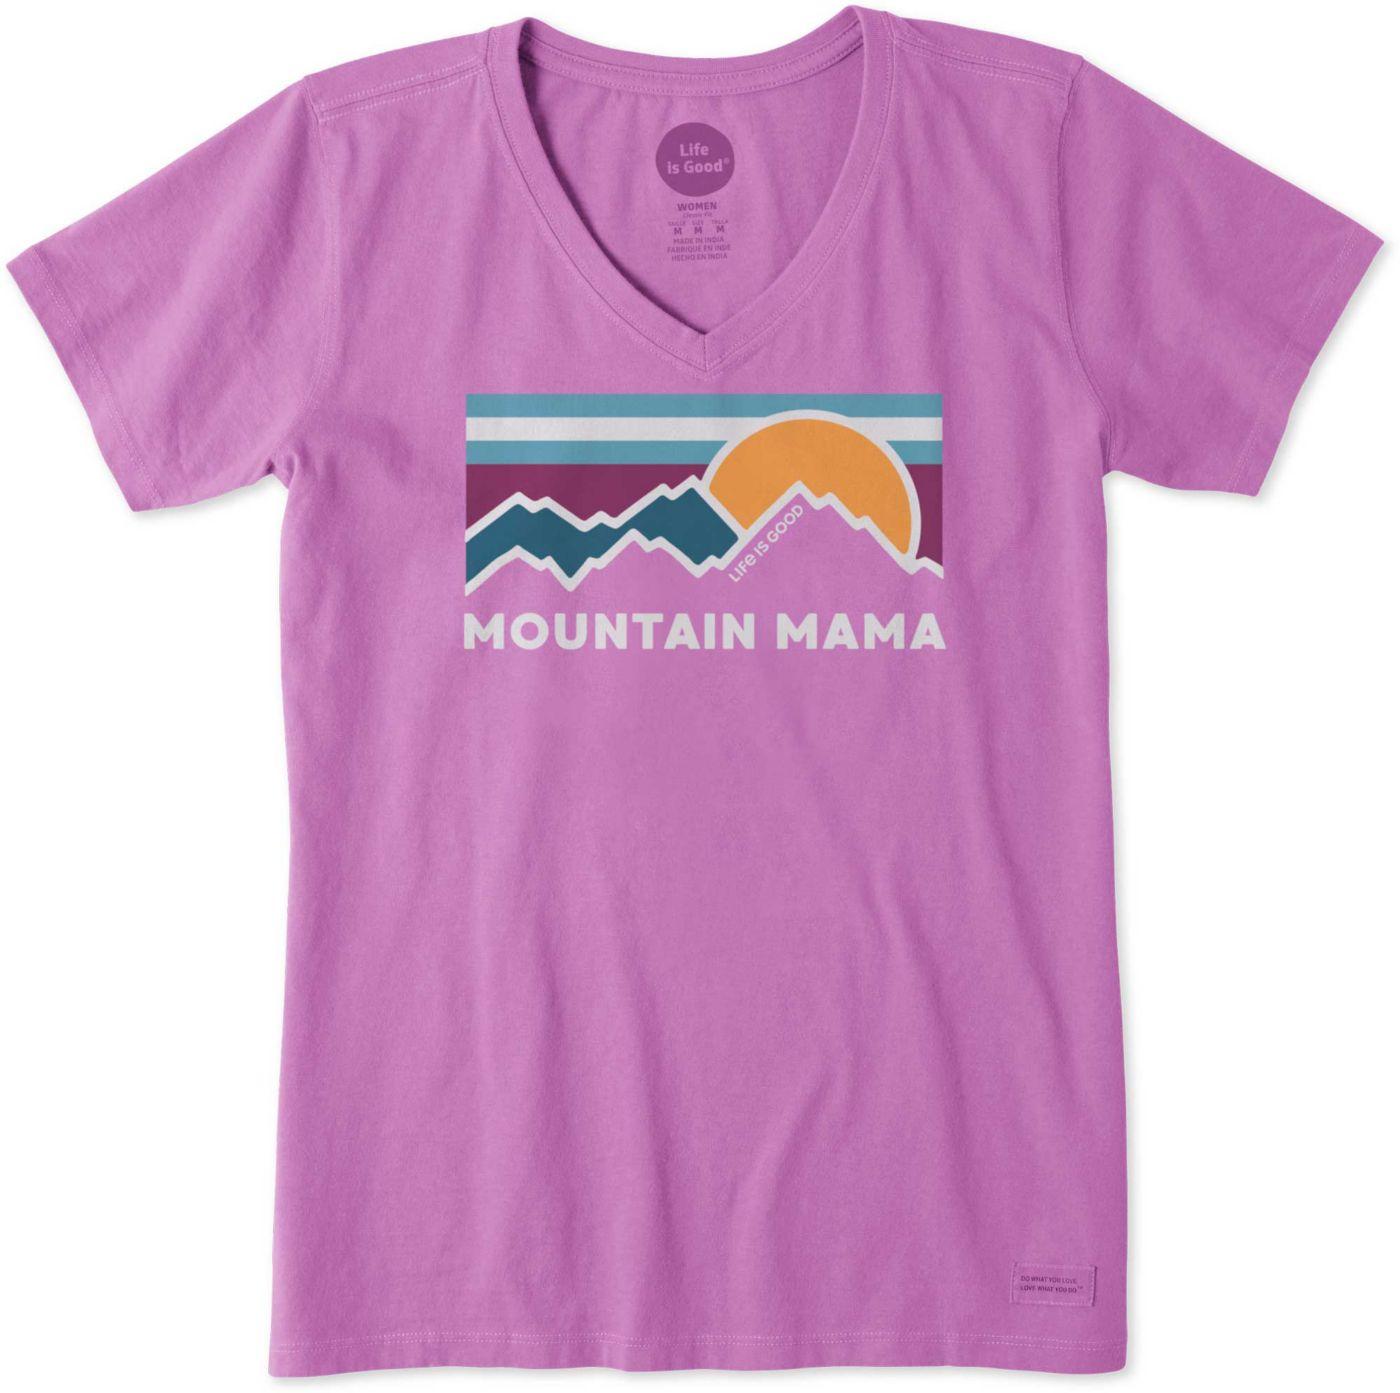 Life is Good Women's Mountain Mama Crusher V-Neck T-Shirt